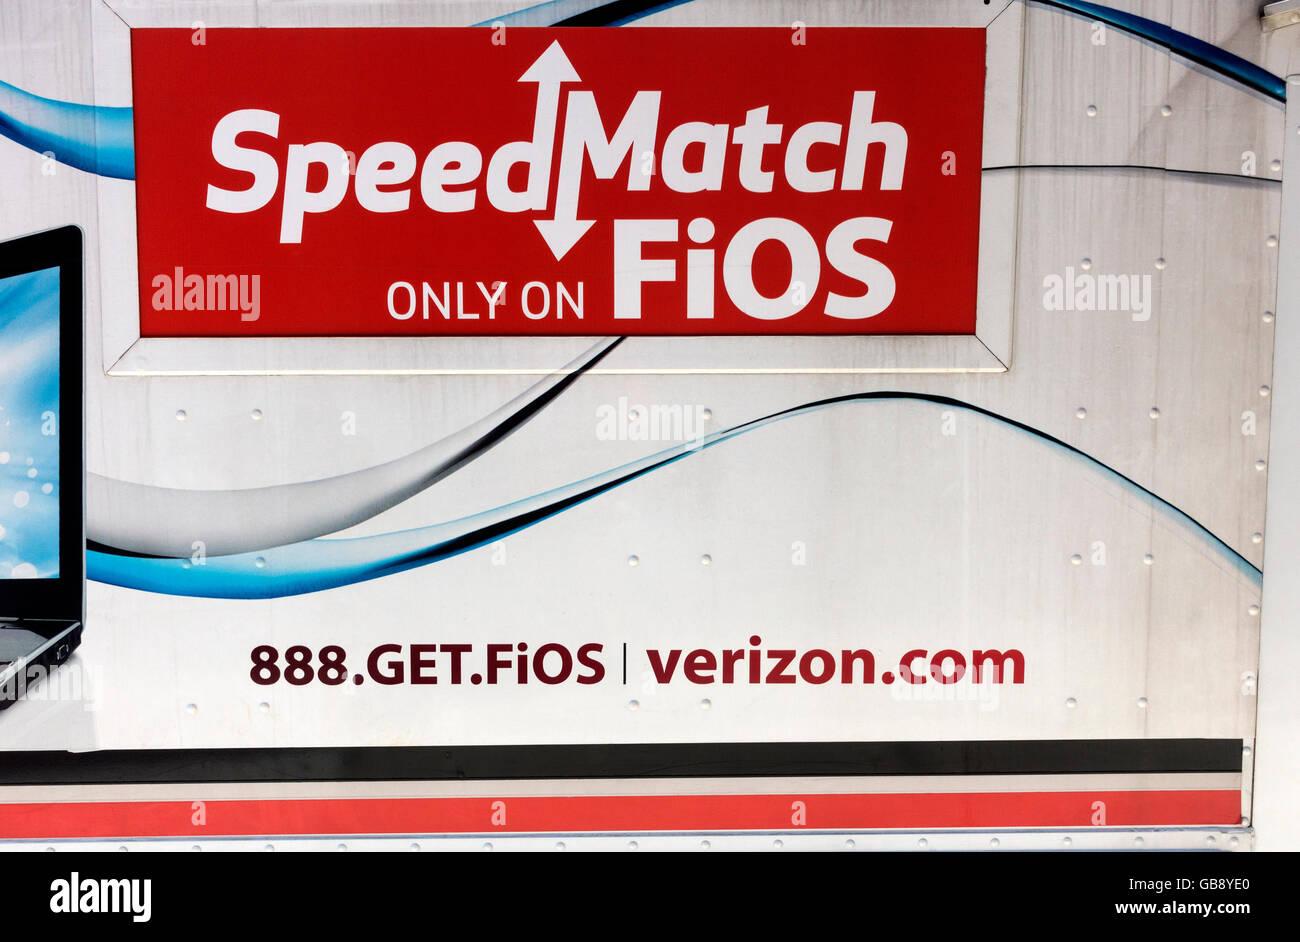 Speed Match FiOS Verizon truck in New York City - Stock Image